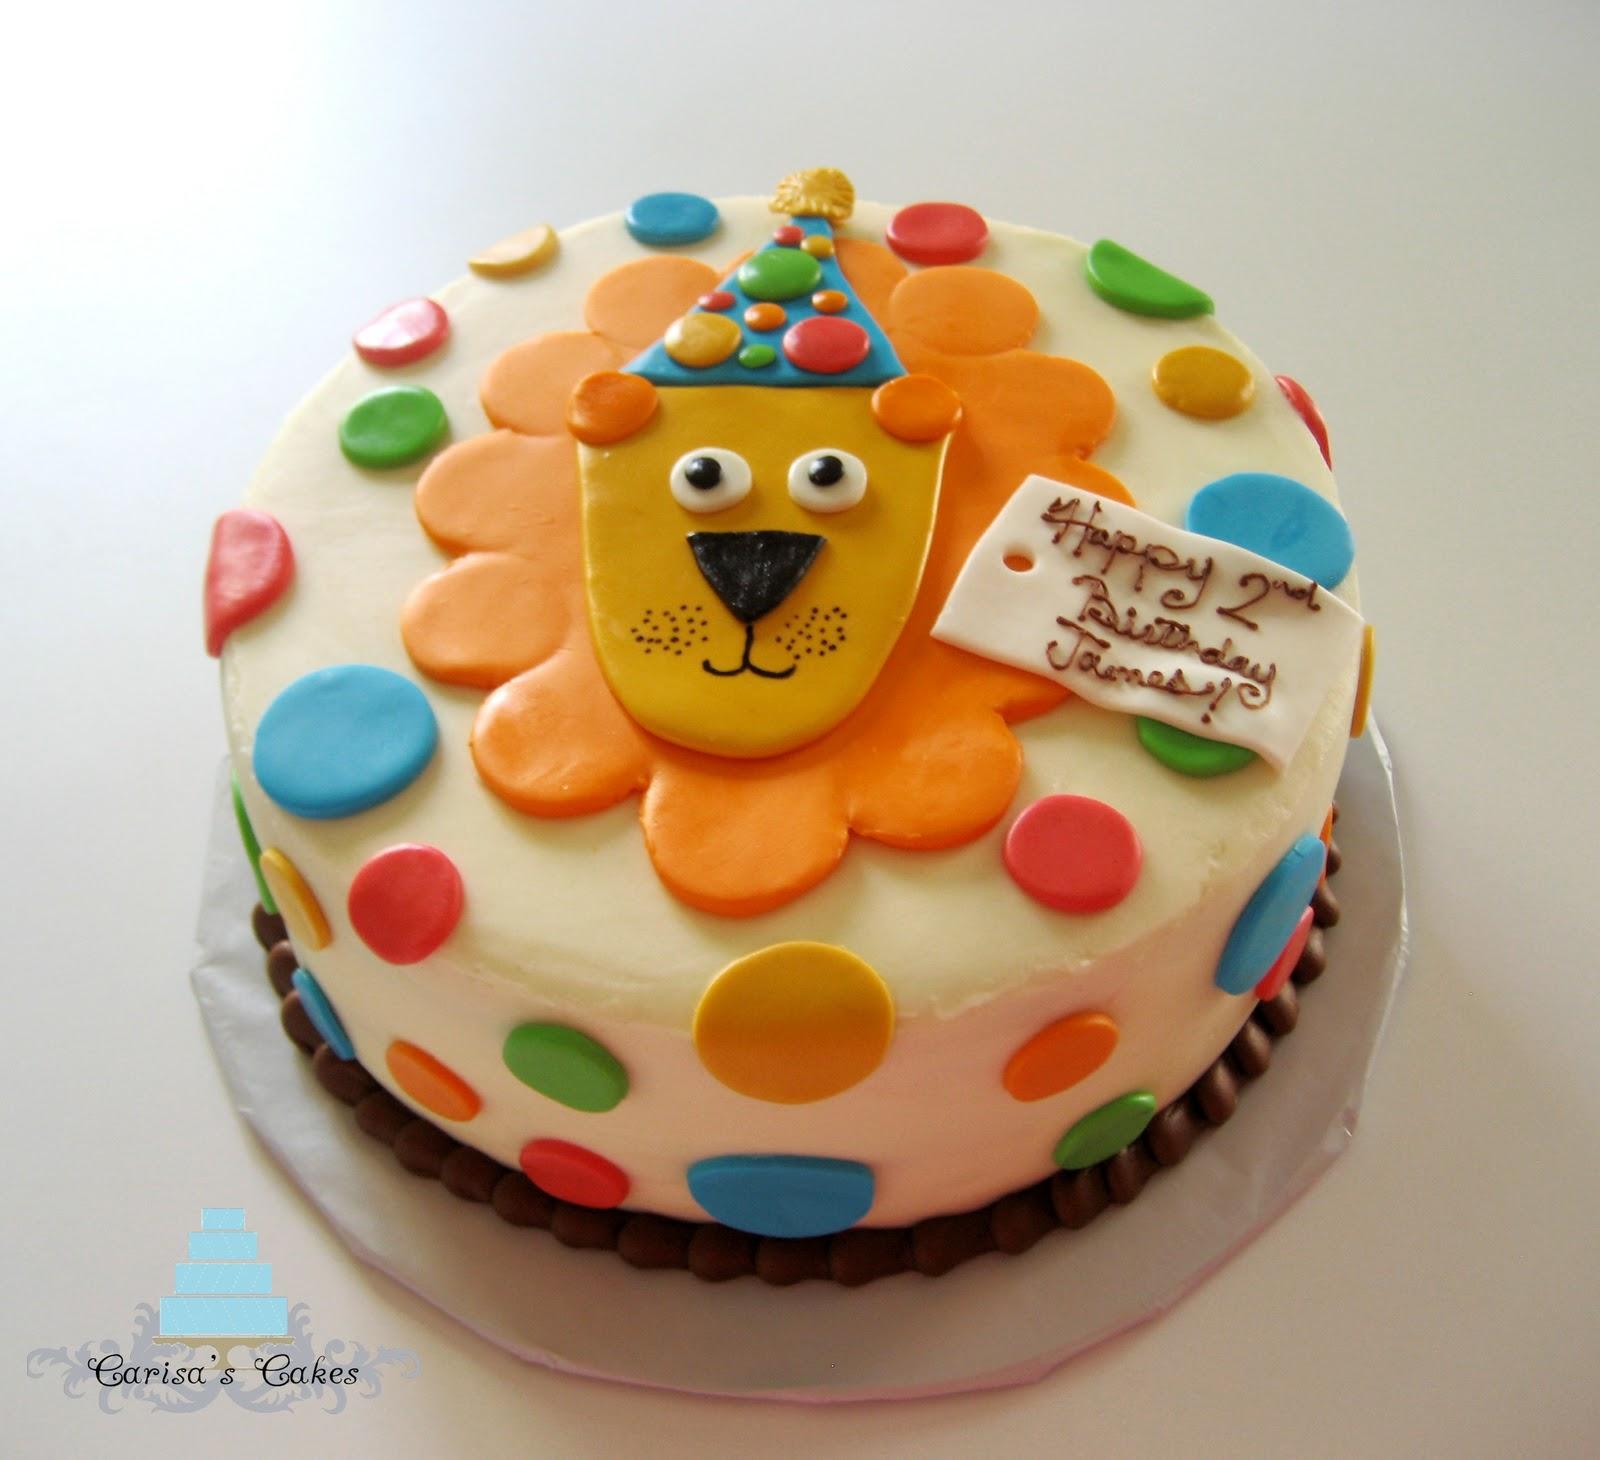 Birthday Cake My Boy Image Inspiration of Cake and Birthday